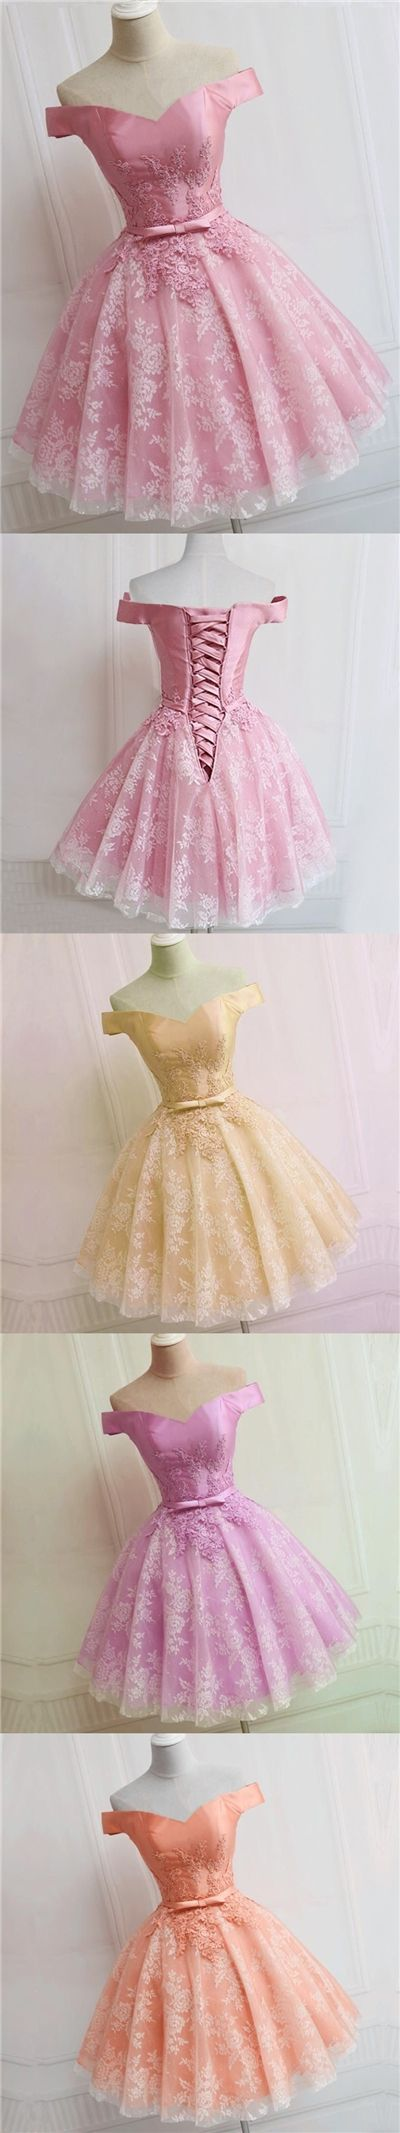 2017 Homecoming Dress Off-the-shoulder Taffeta Short Prom Dress Party Dress JK234